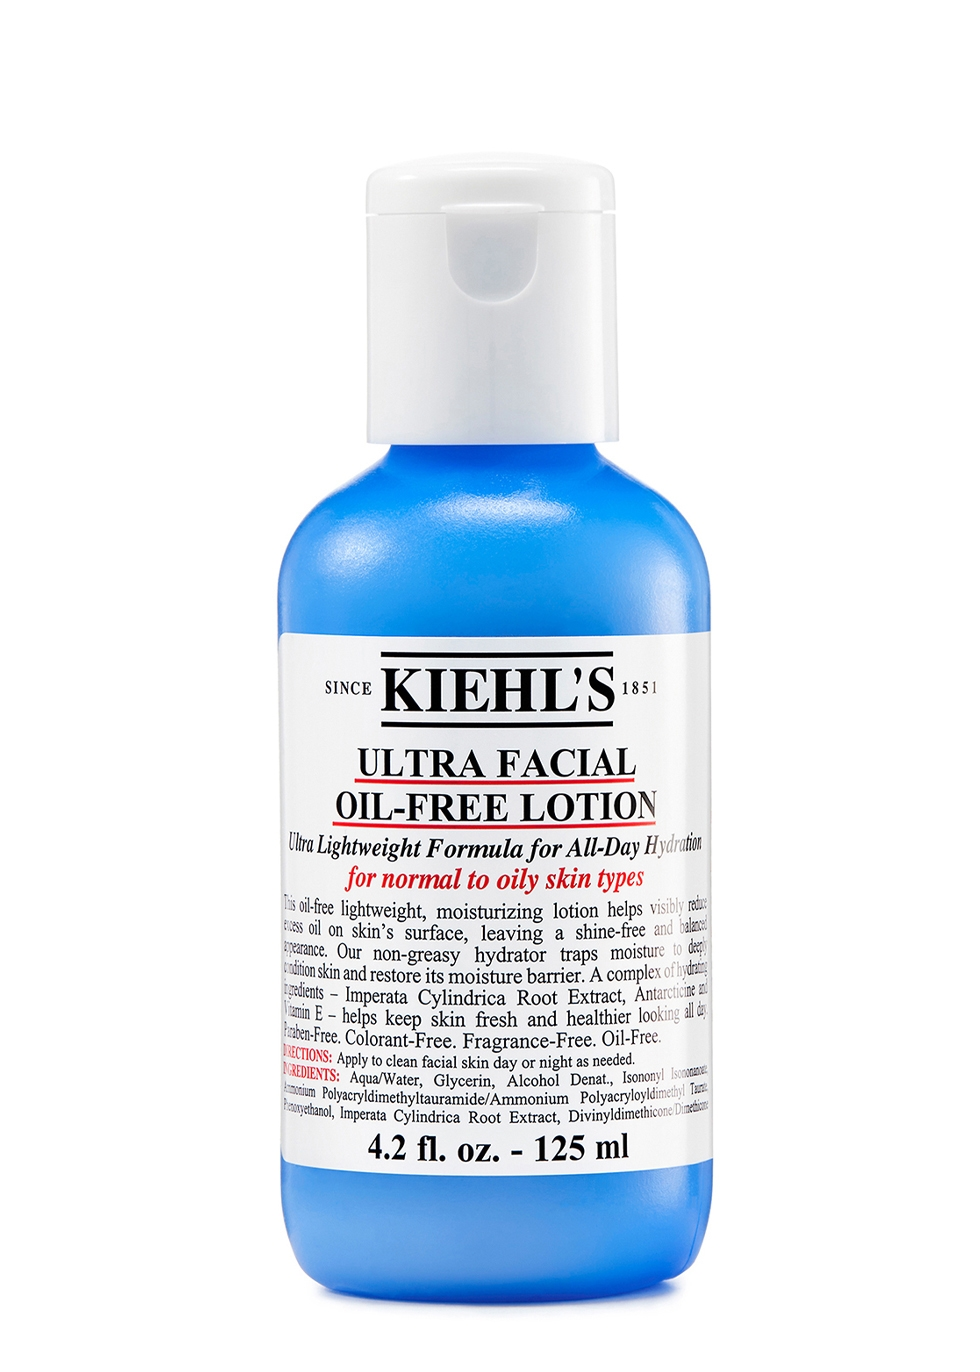 Ultra Facial Oil-Free Lotion 125ml